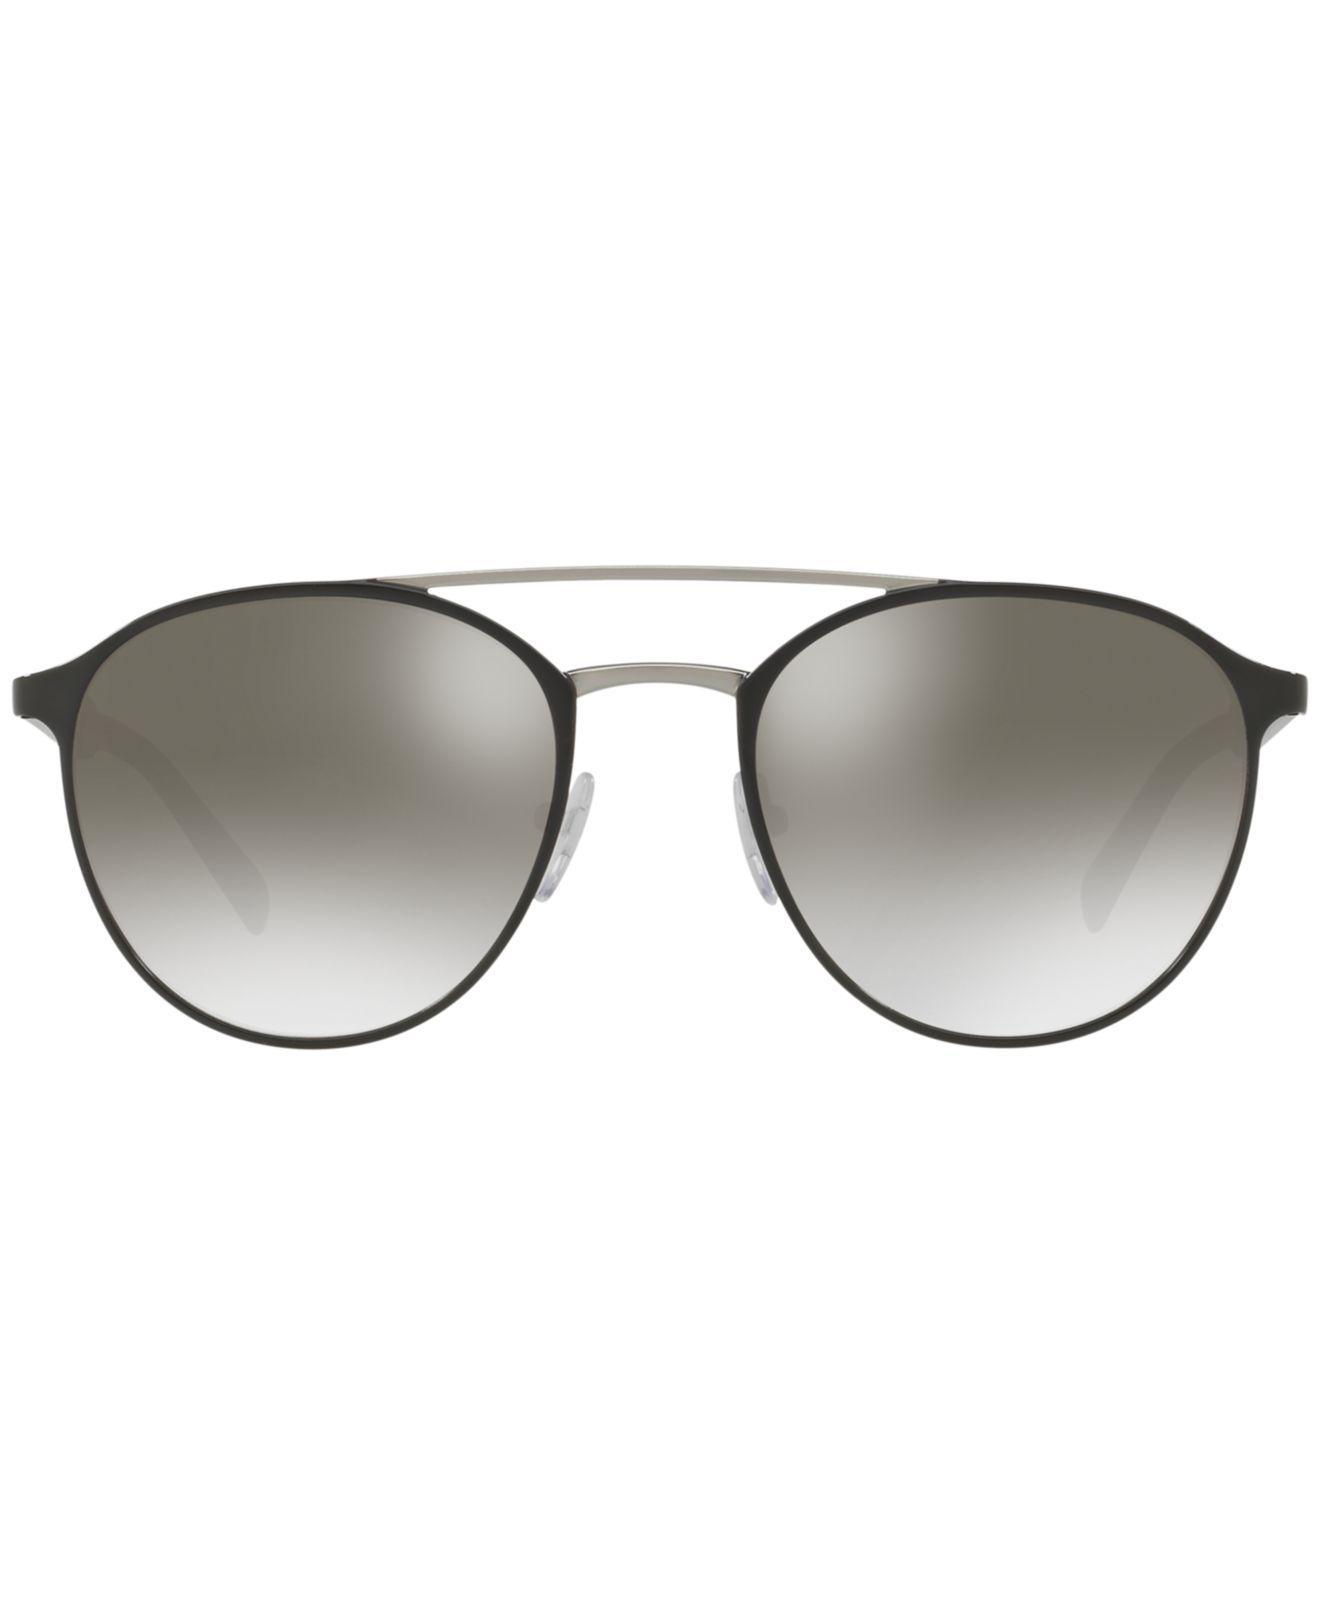 0c4bf37b09c1 Lyst - Prada Sunglasses